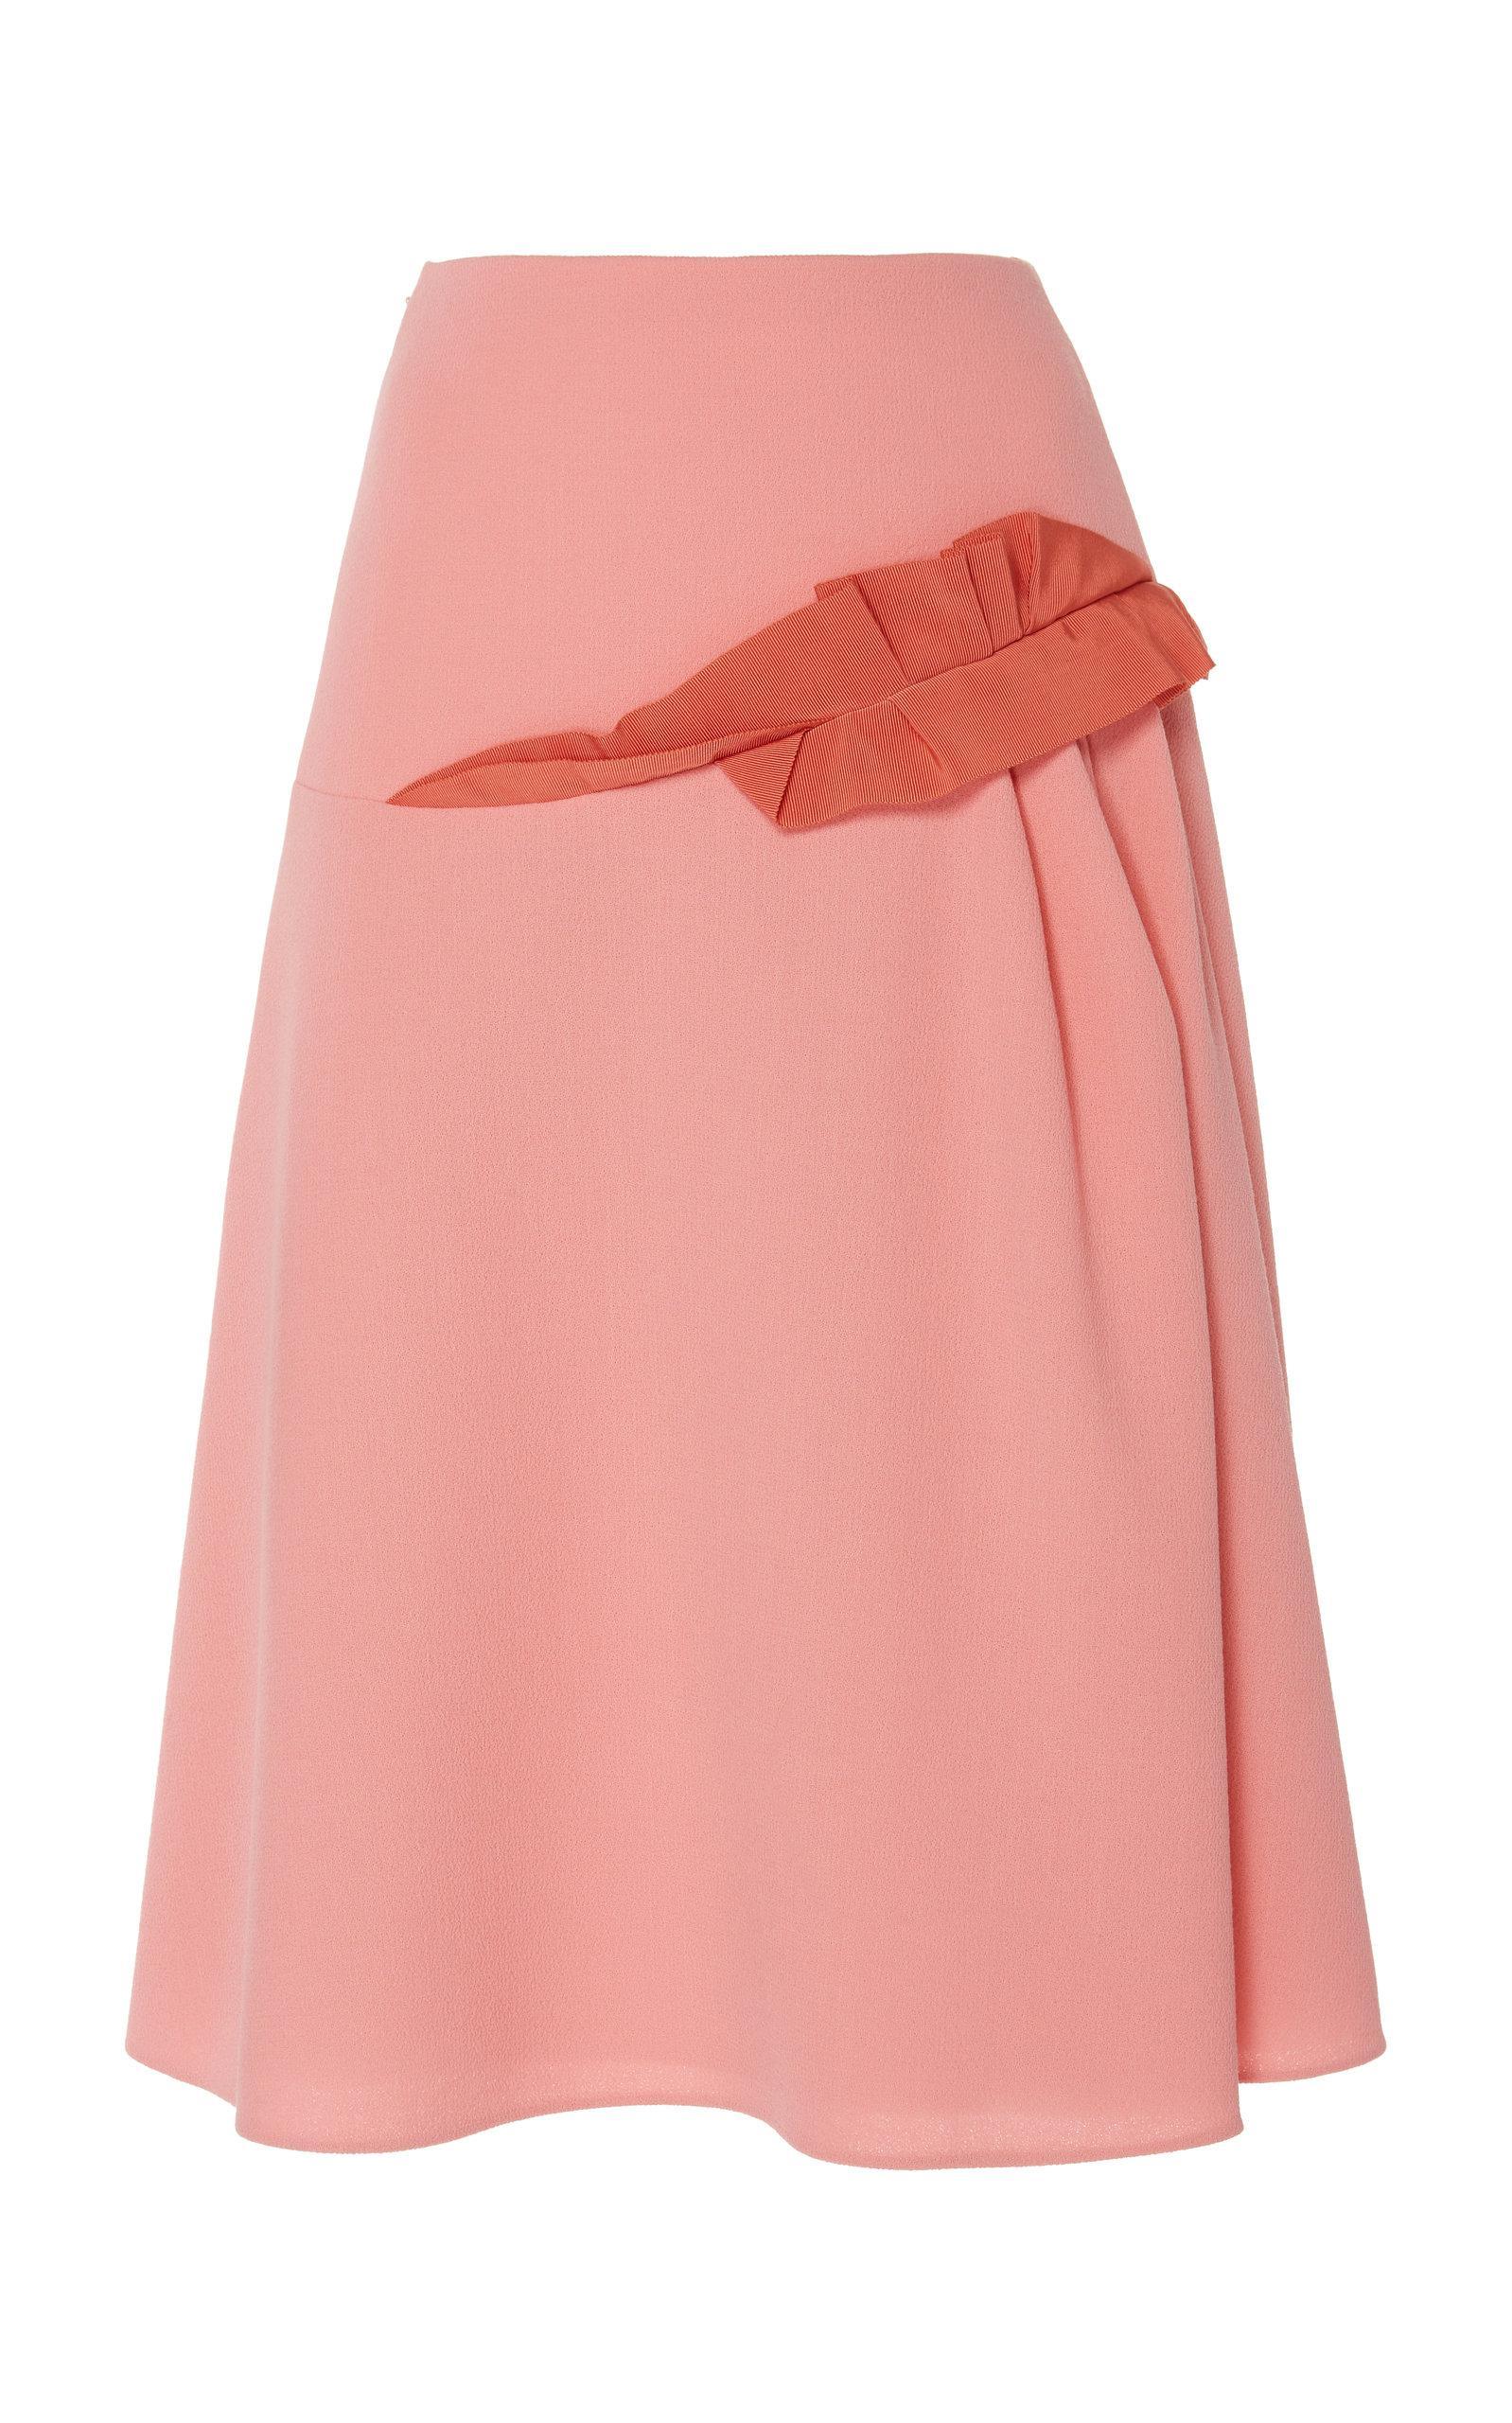 24c23bb4ad Delpozo Grosgrain Crepe Midi Skirt in Pink - Lyst